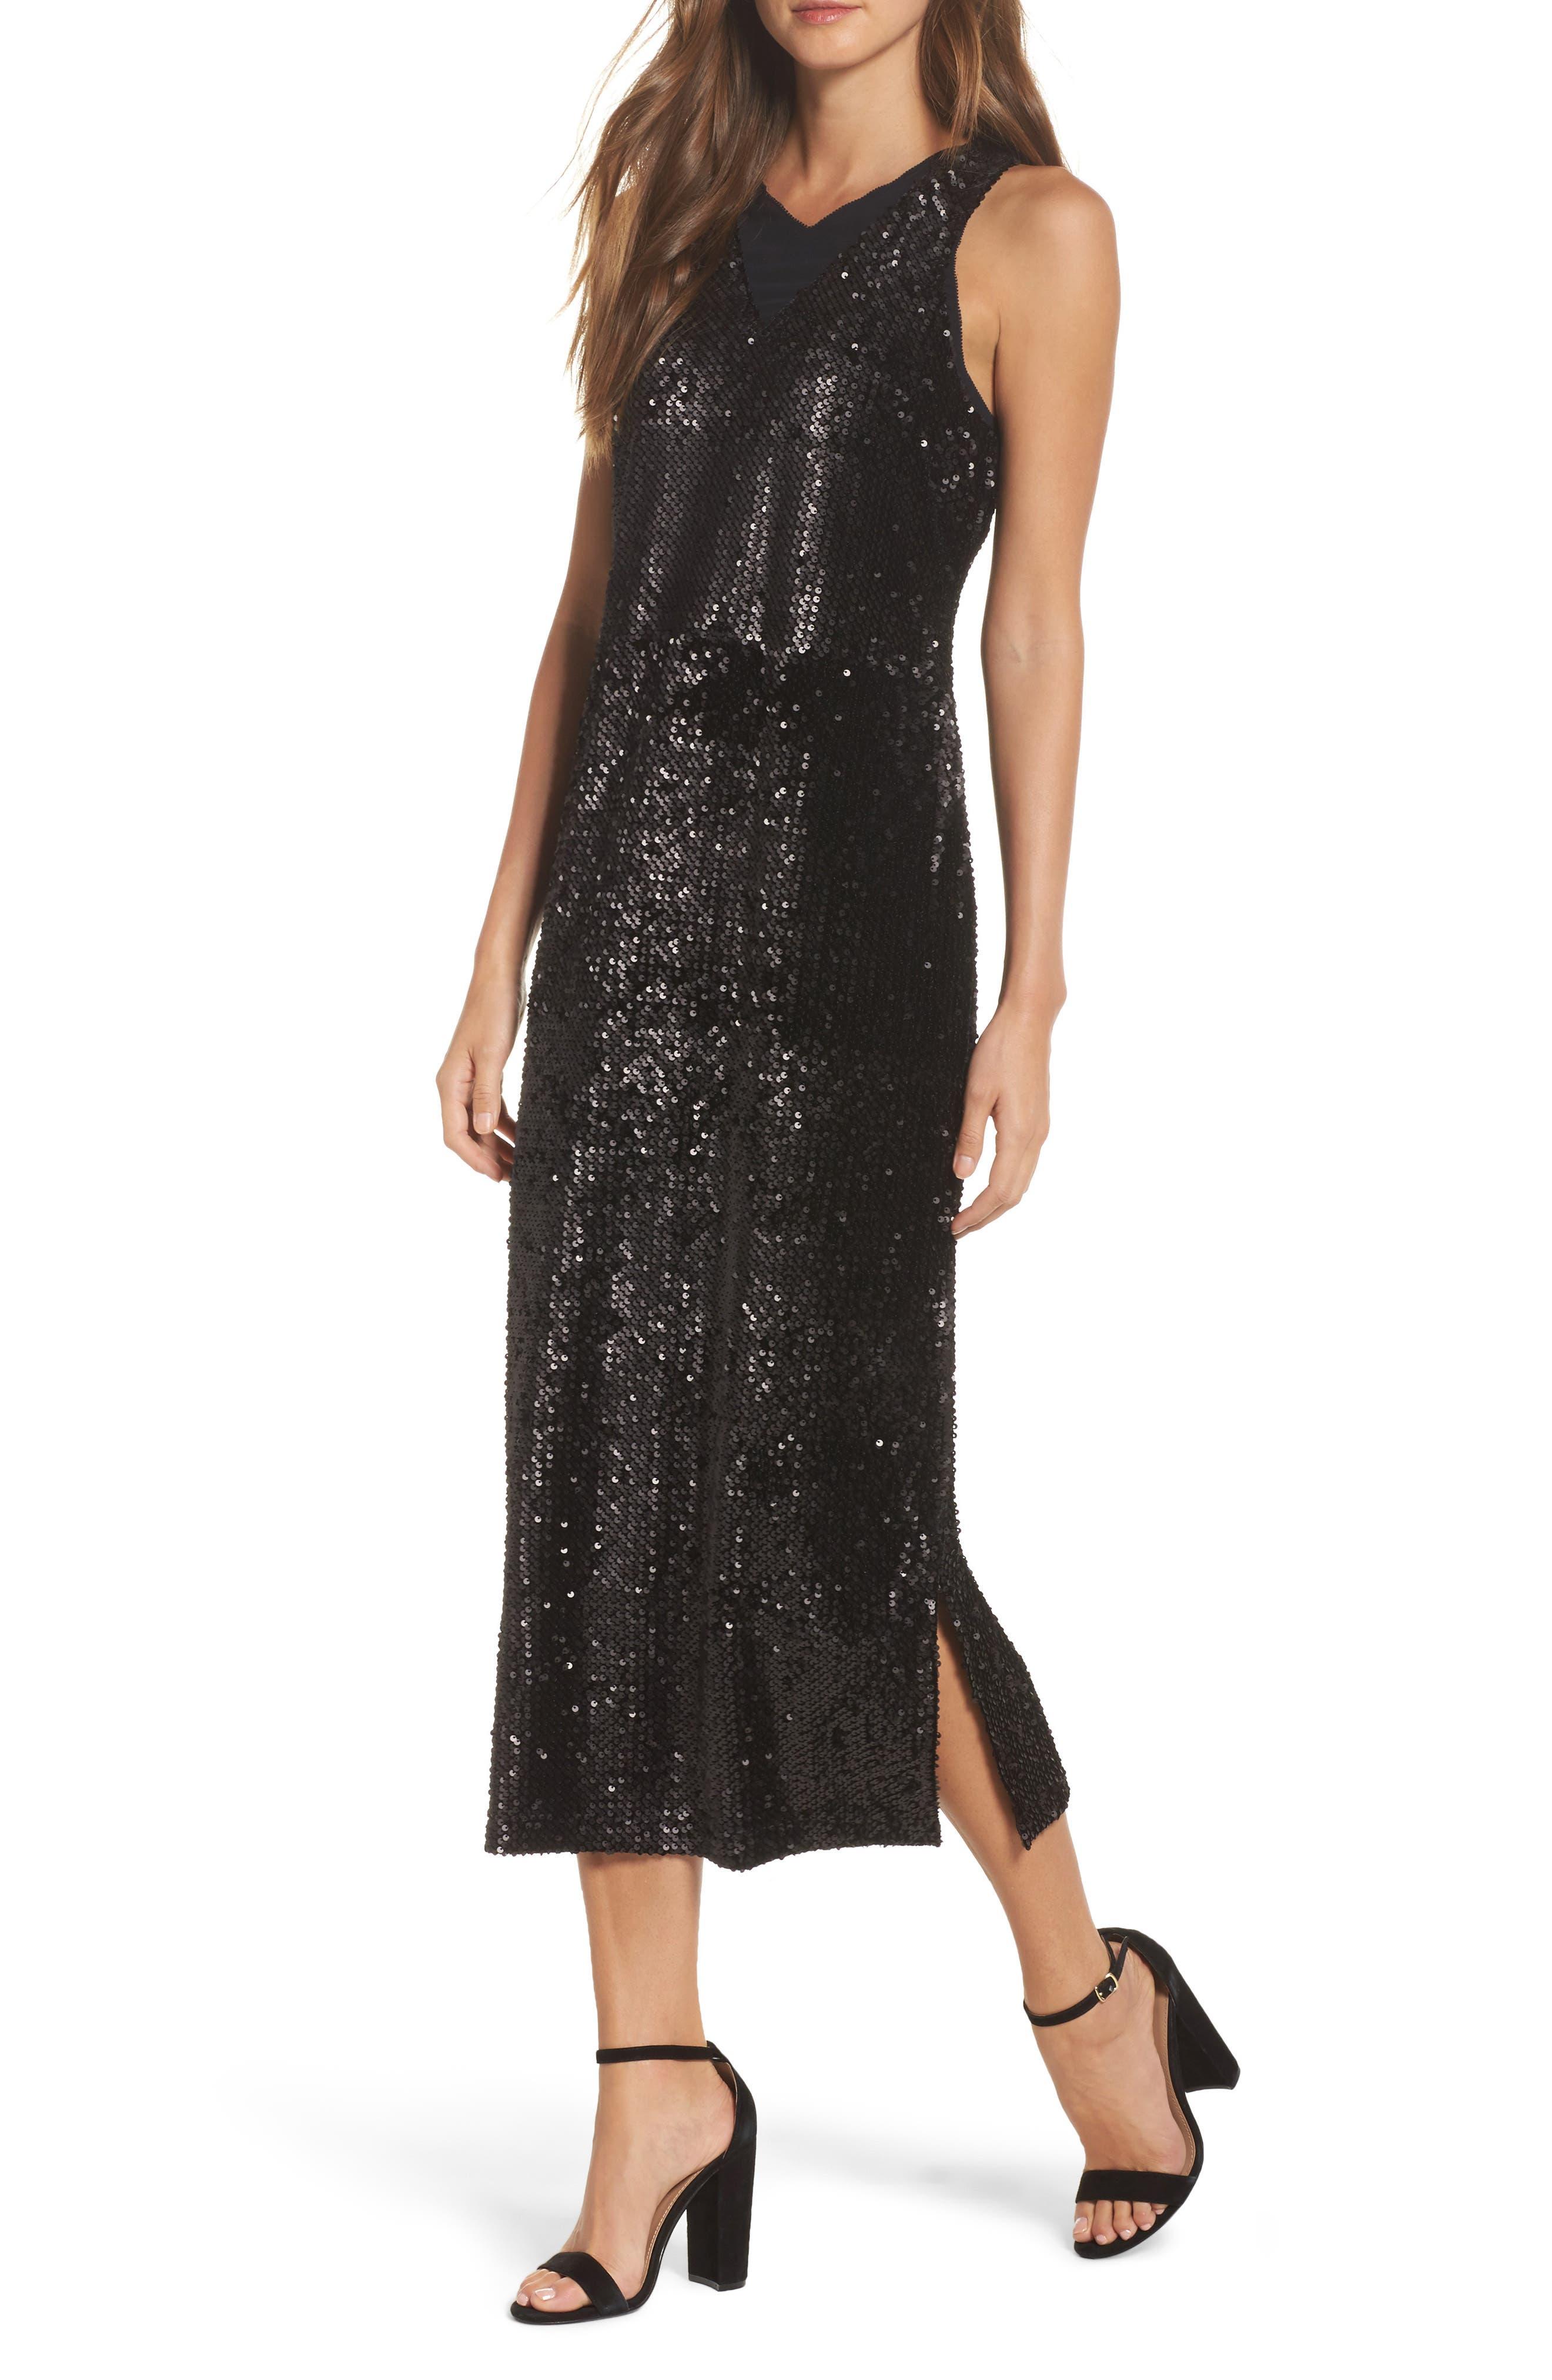 Main Image - NIC+ZOE Night Shimmer Sequin Midi Dress